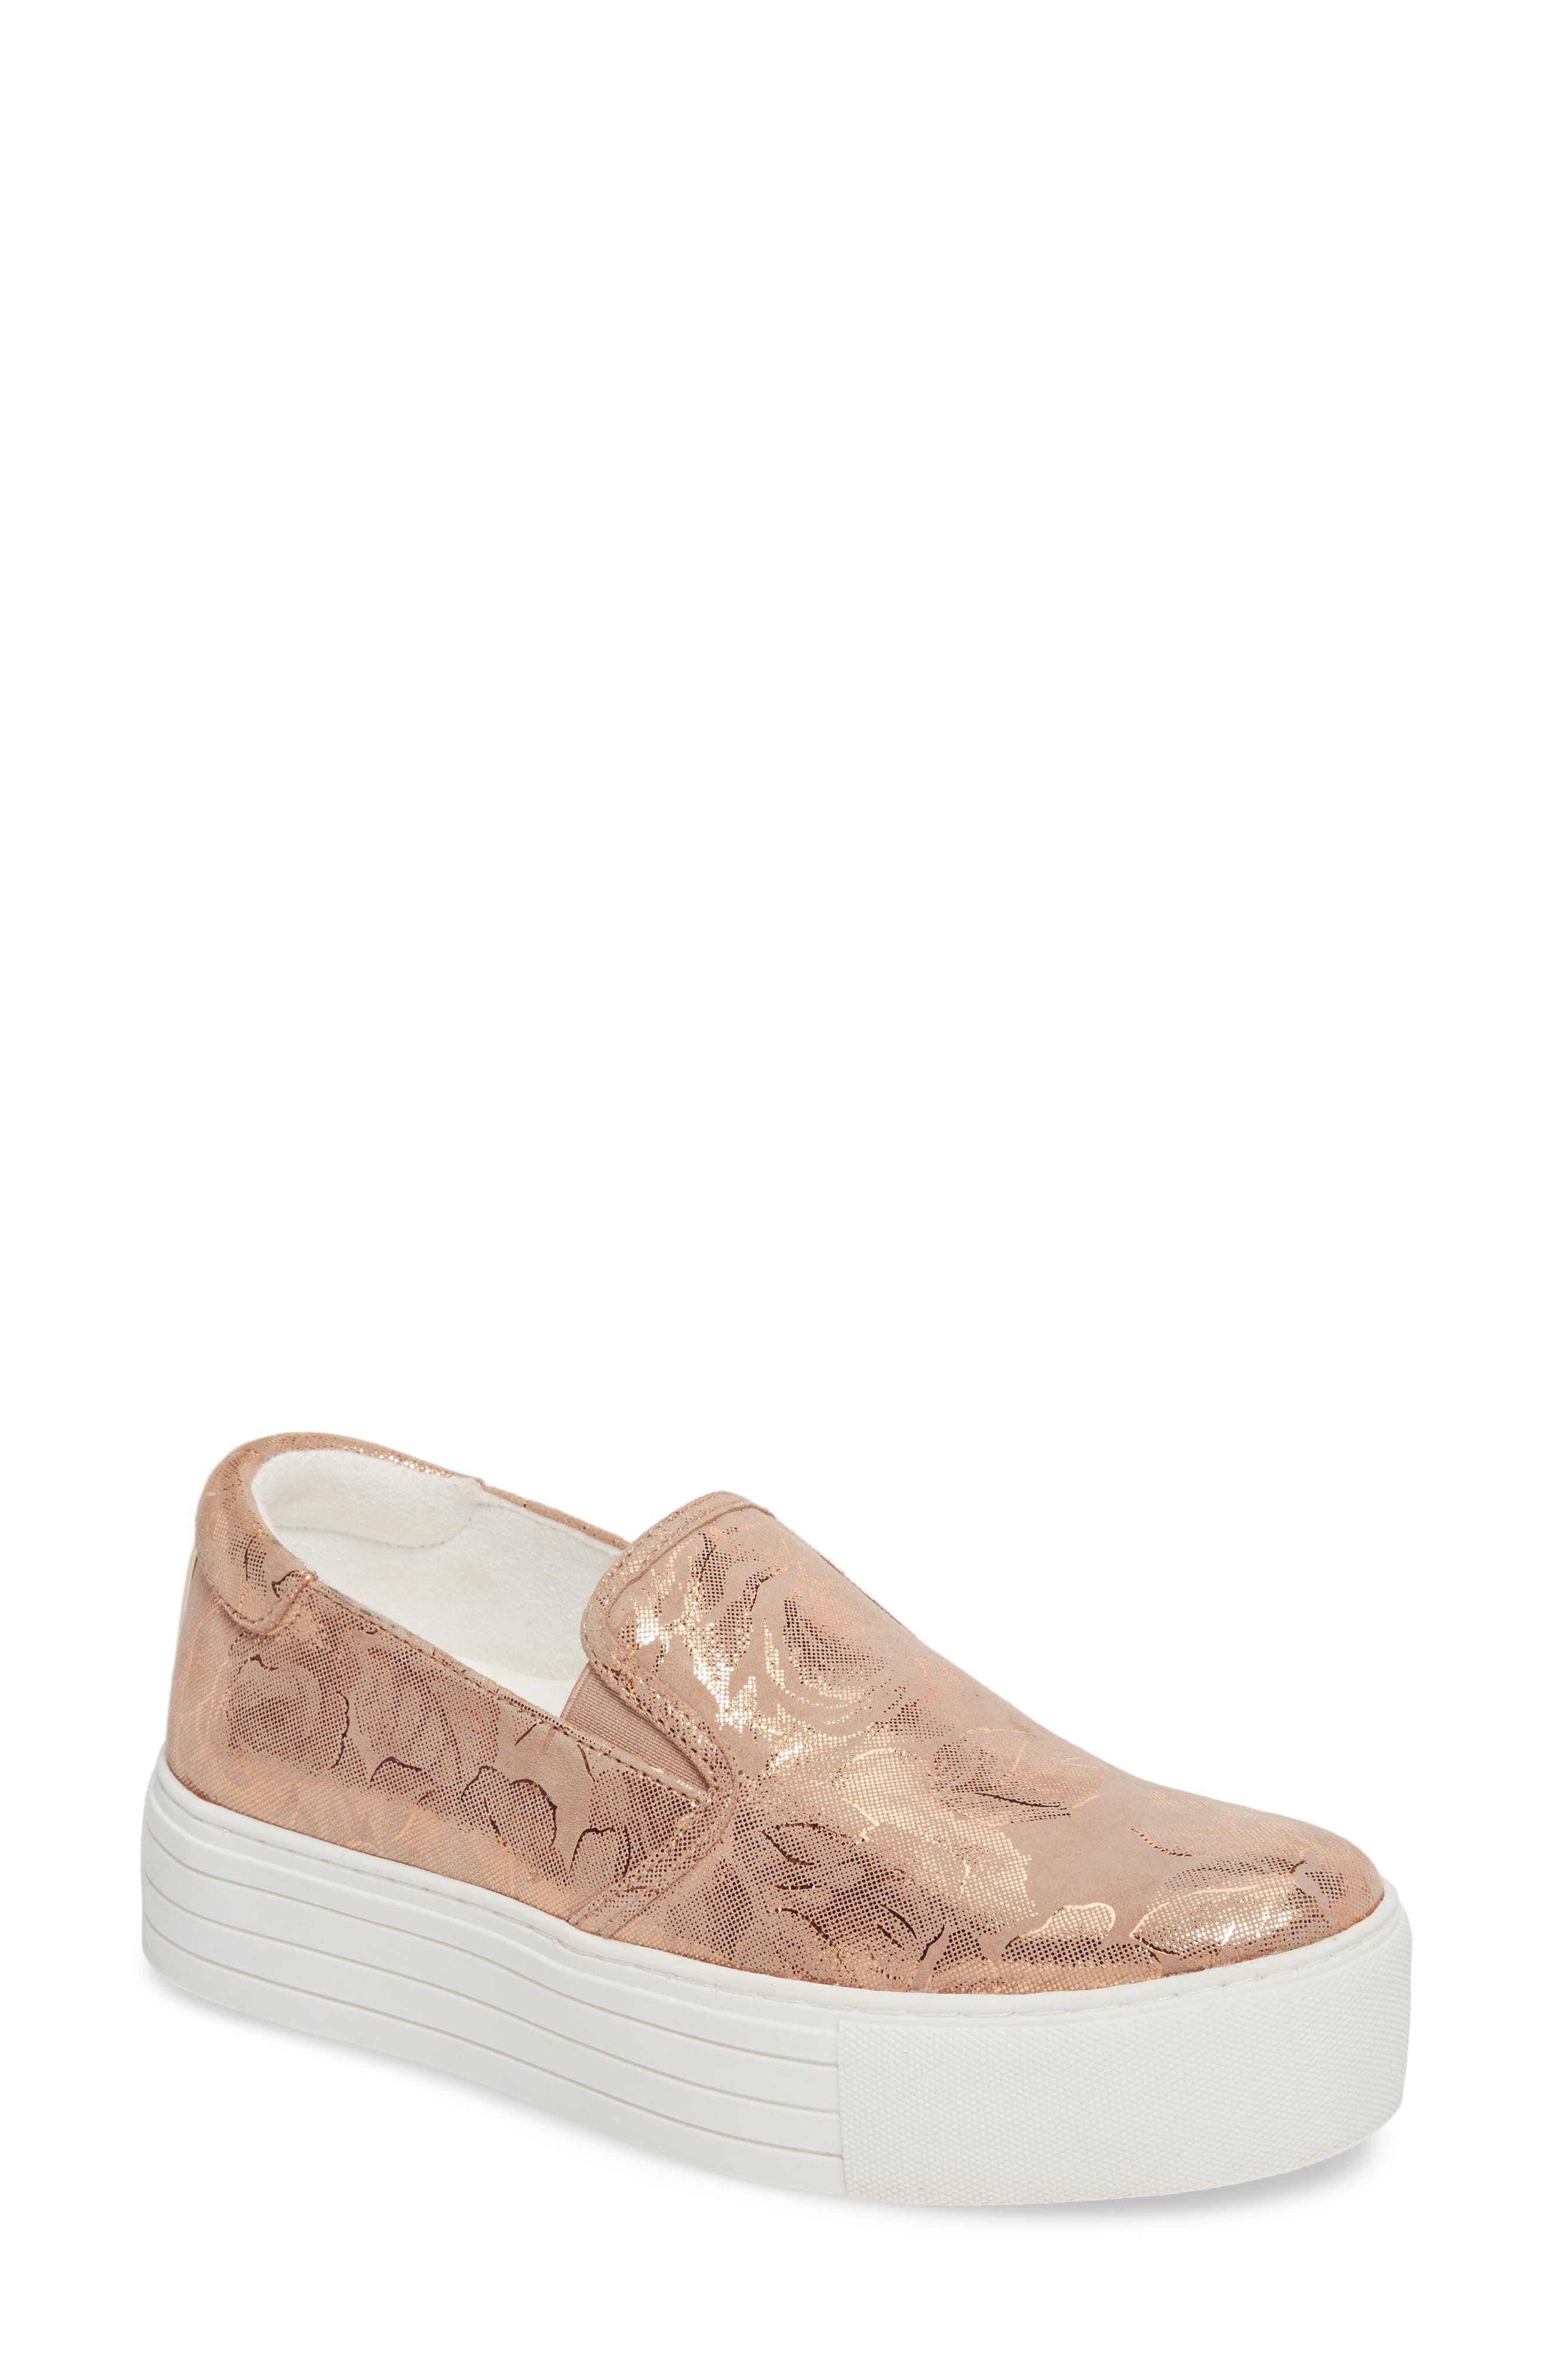 Joanie Slip-On Platform Sneaker,                             Main thumbnail 6, color,